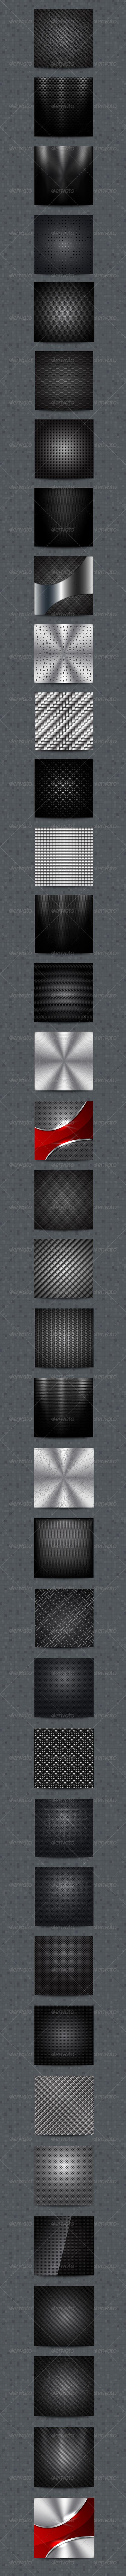 GraphicRiver 37 Vector Metal Textures 5252078